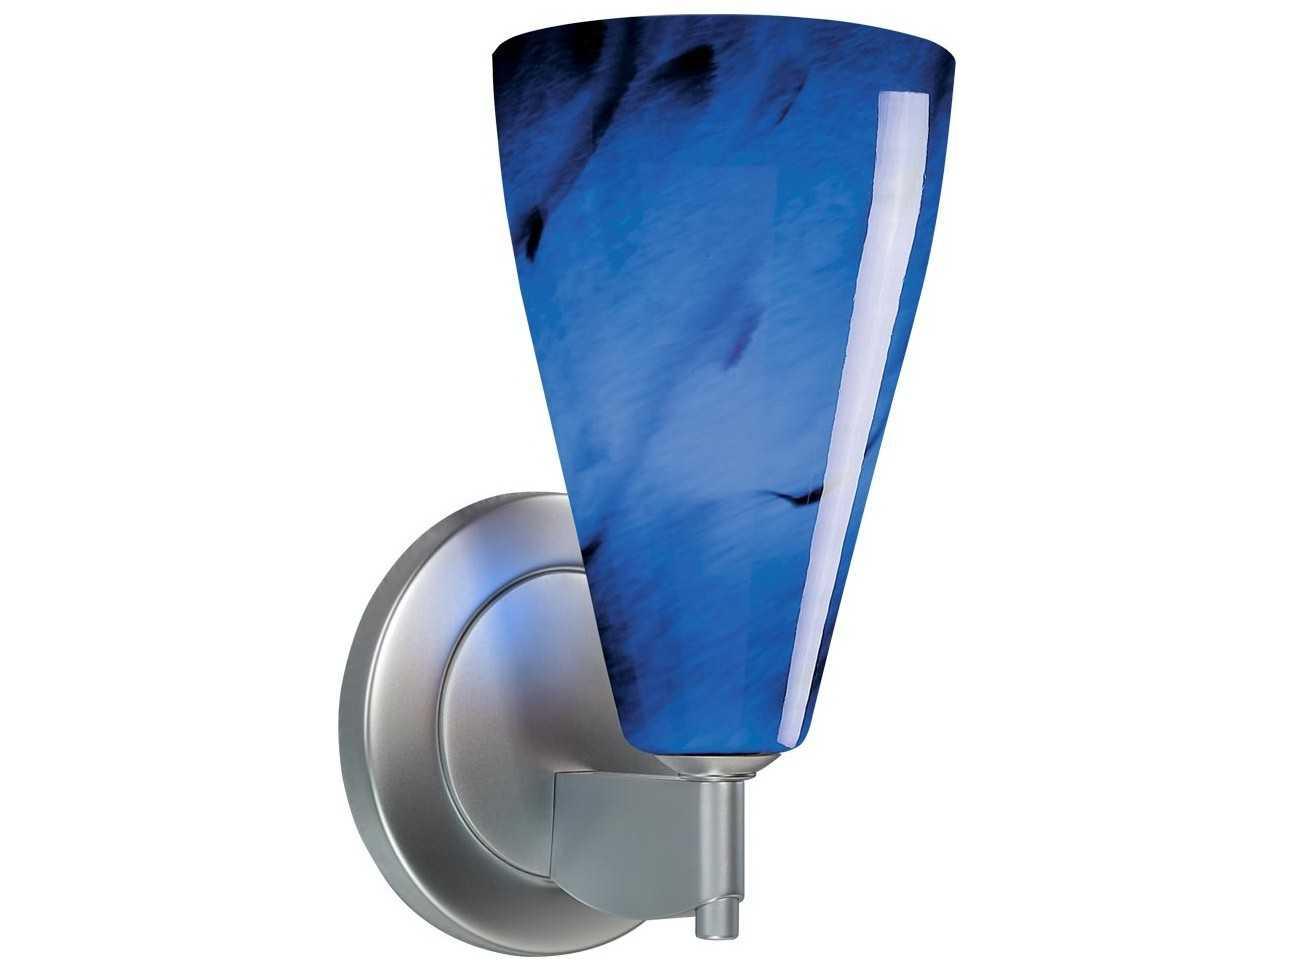 Bruck Lighting Zara Blue Glass Wall Sconce BK100302